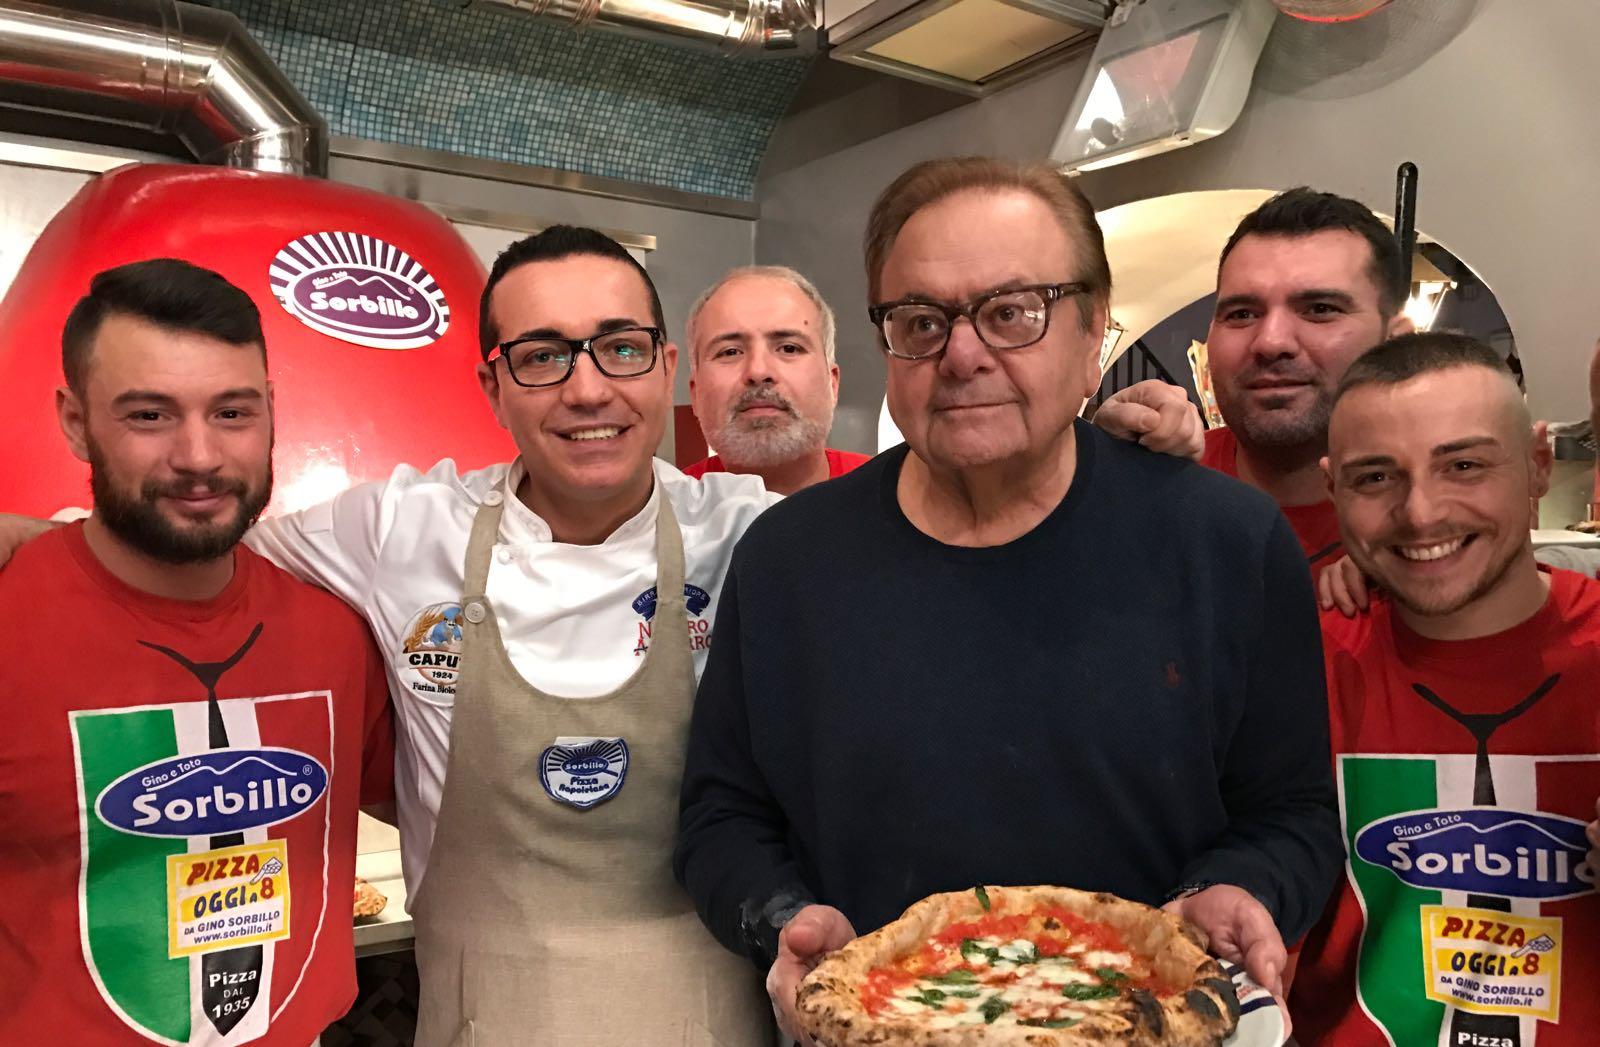 Gino Sorbillo Paul Sorvino